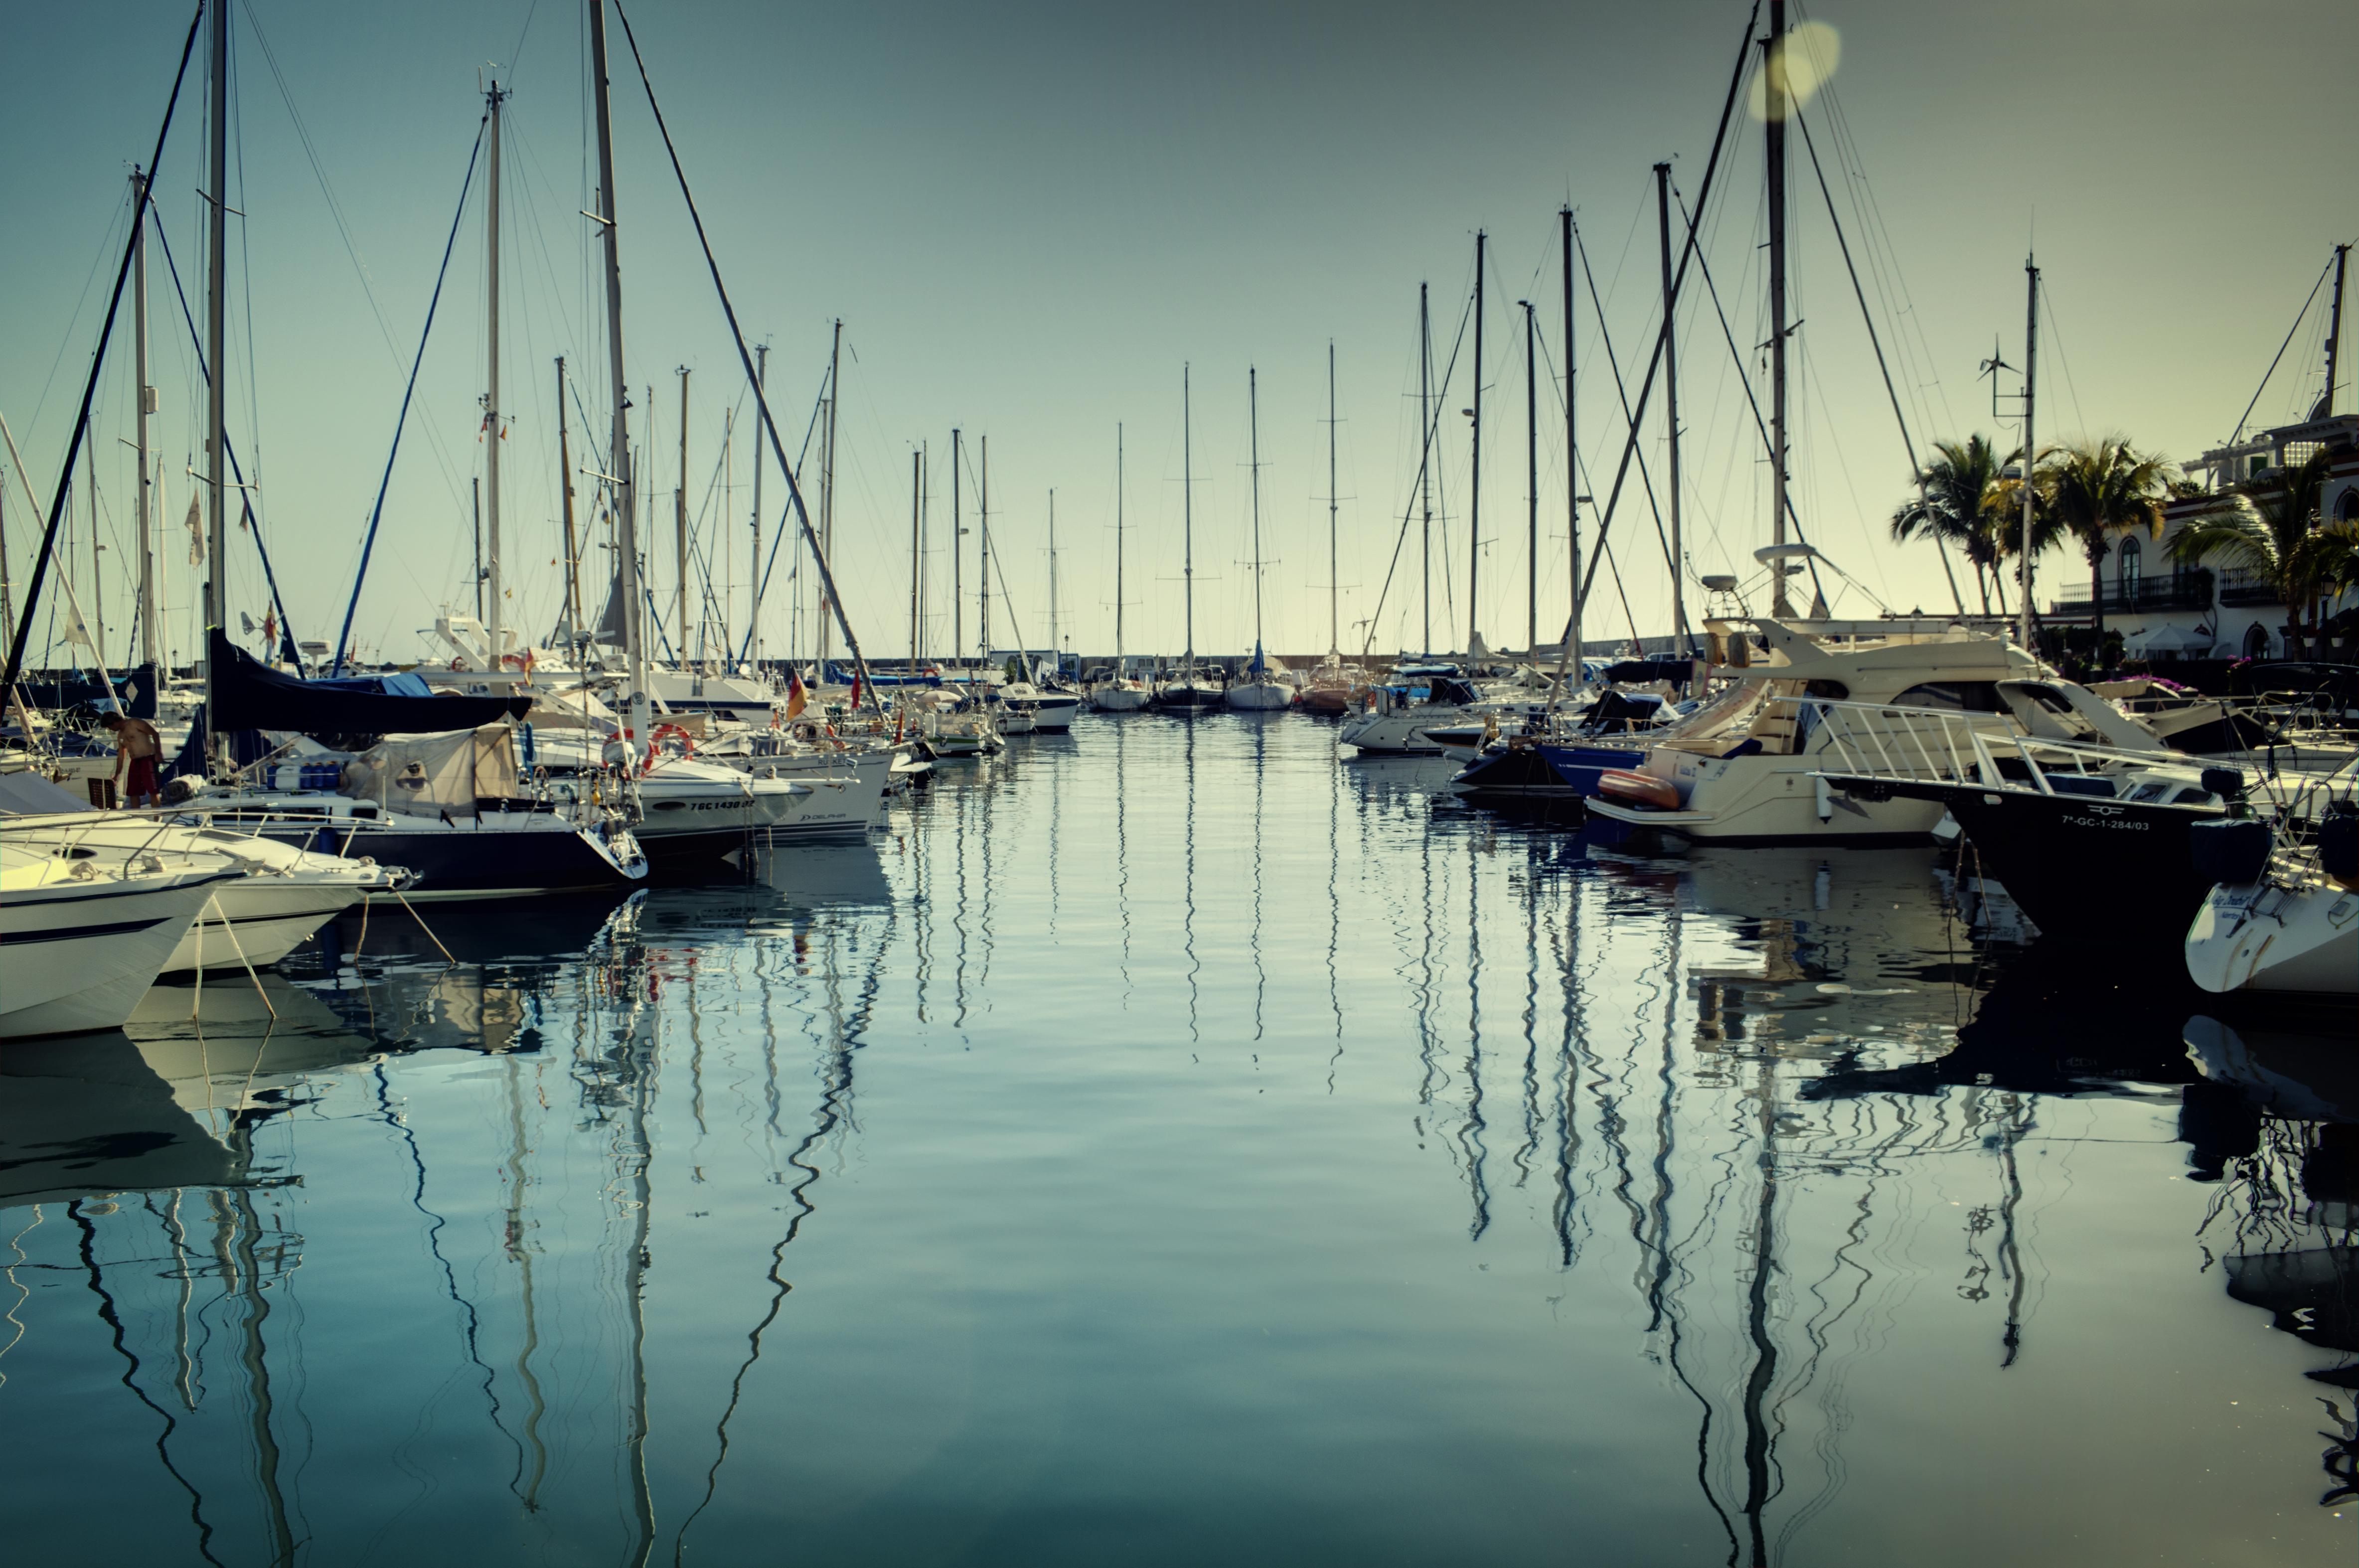 Puerto de mogan reflections photo